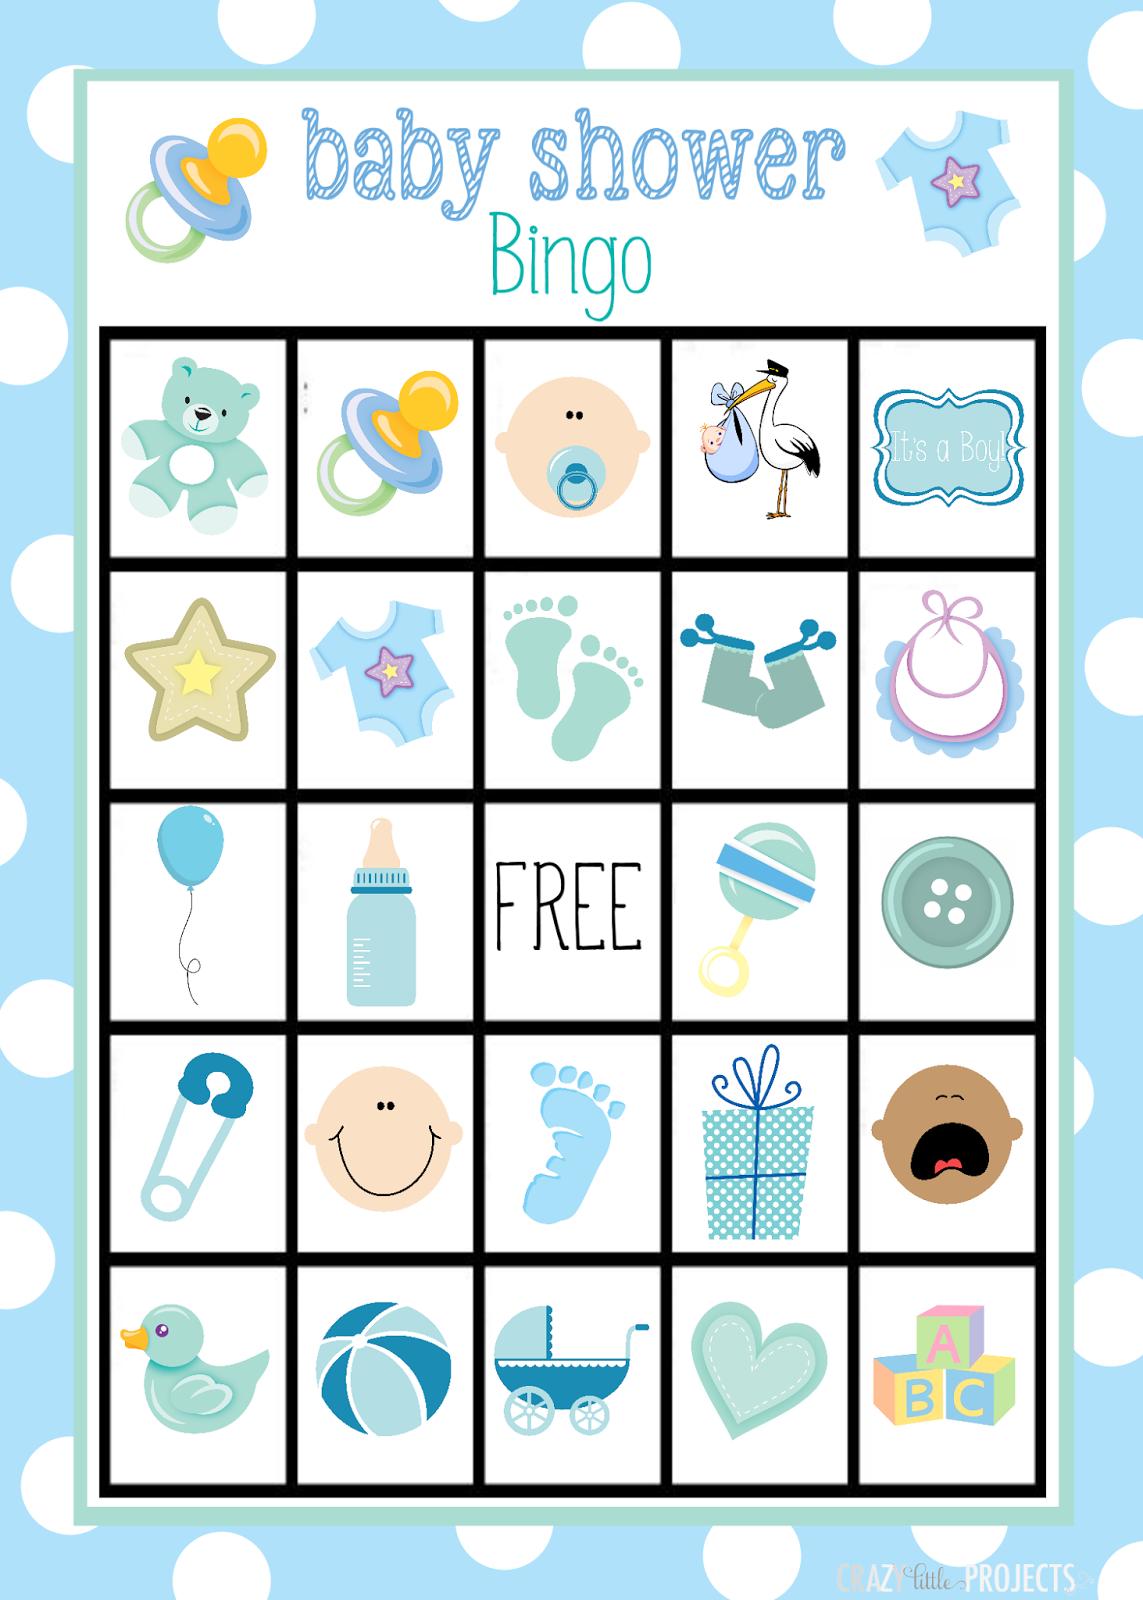 Bingo Para Baby Shower De Nino Para Imprimir Gratis Tarjetas